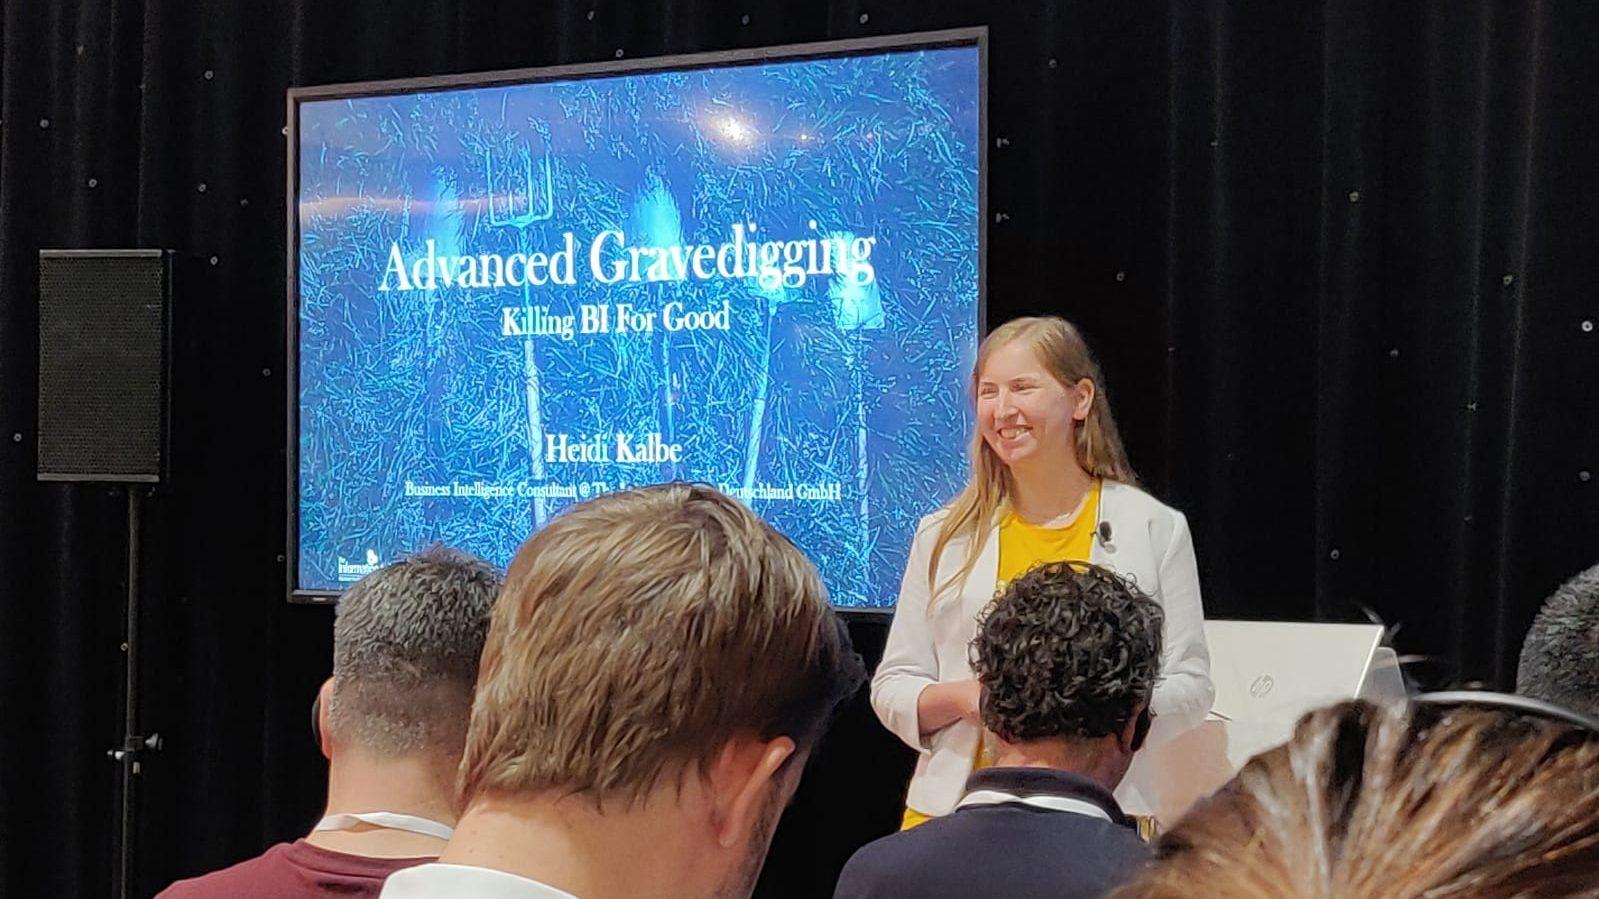 Heidi Kalbe at Tableau Conference Europe 2019 in Berlin: Advanced Gravedigging - Killing BI For Good